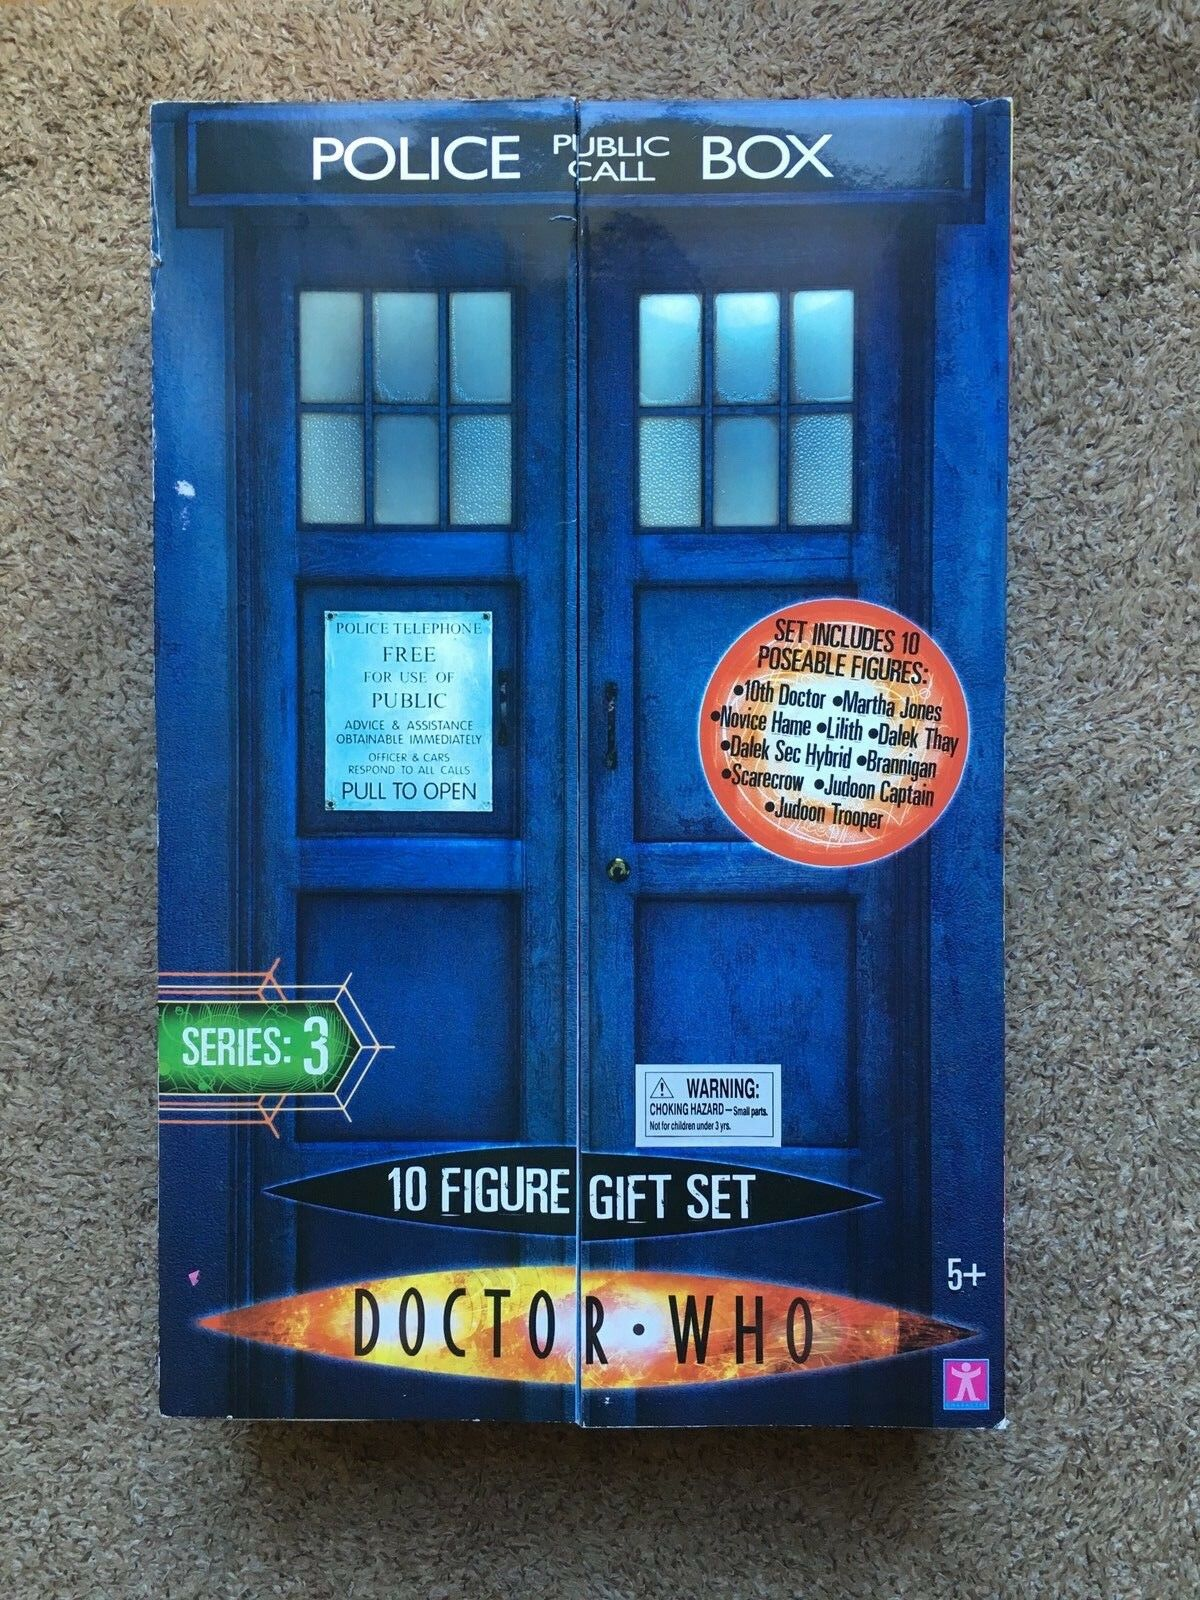 Dr Who series 3 10 action figure box set